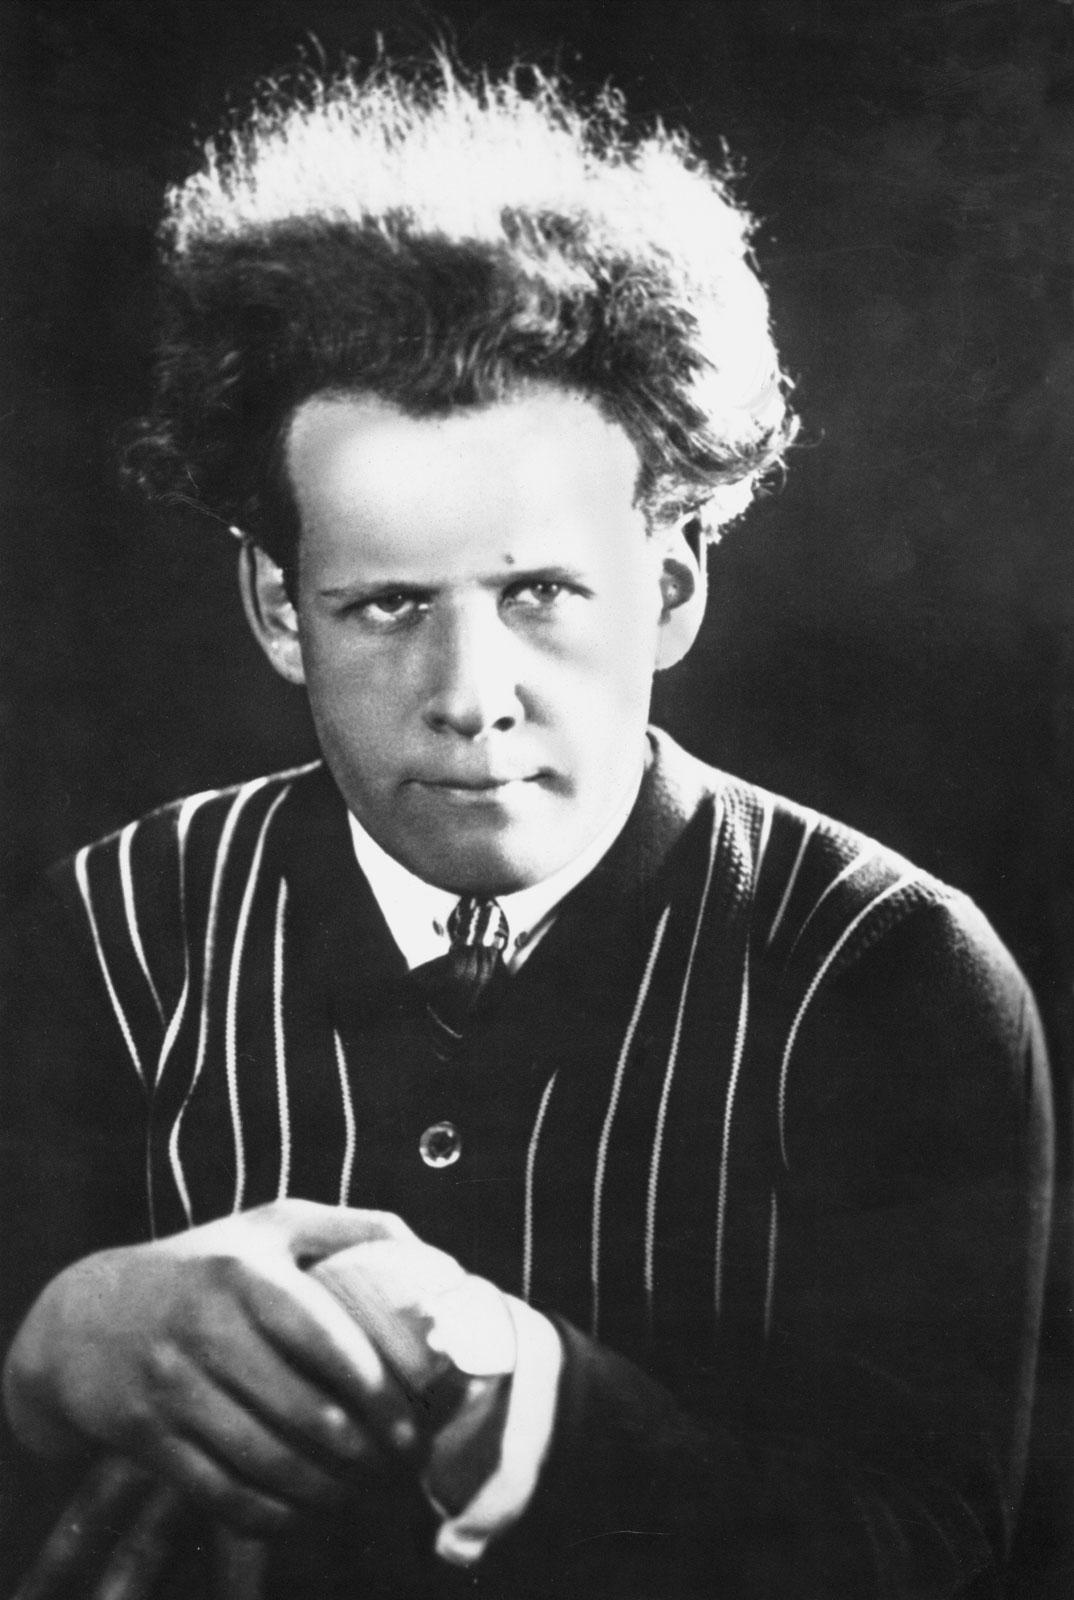 https://upload.wikimedia.org/wikipedia/commons/2/26/Sergei_Eisenstein_03.jpg